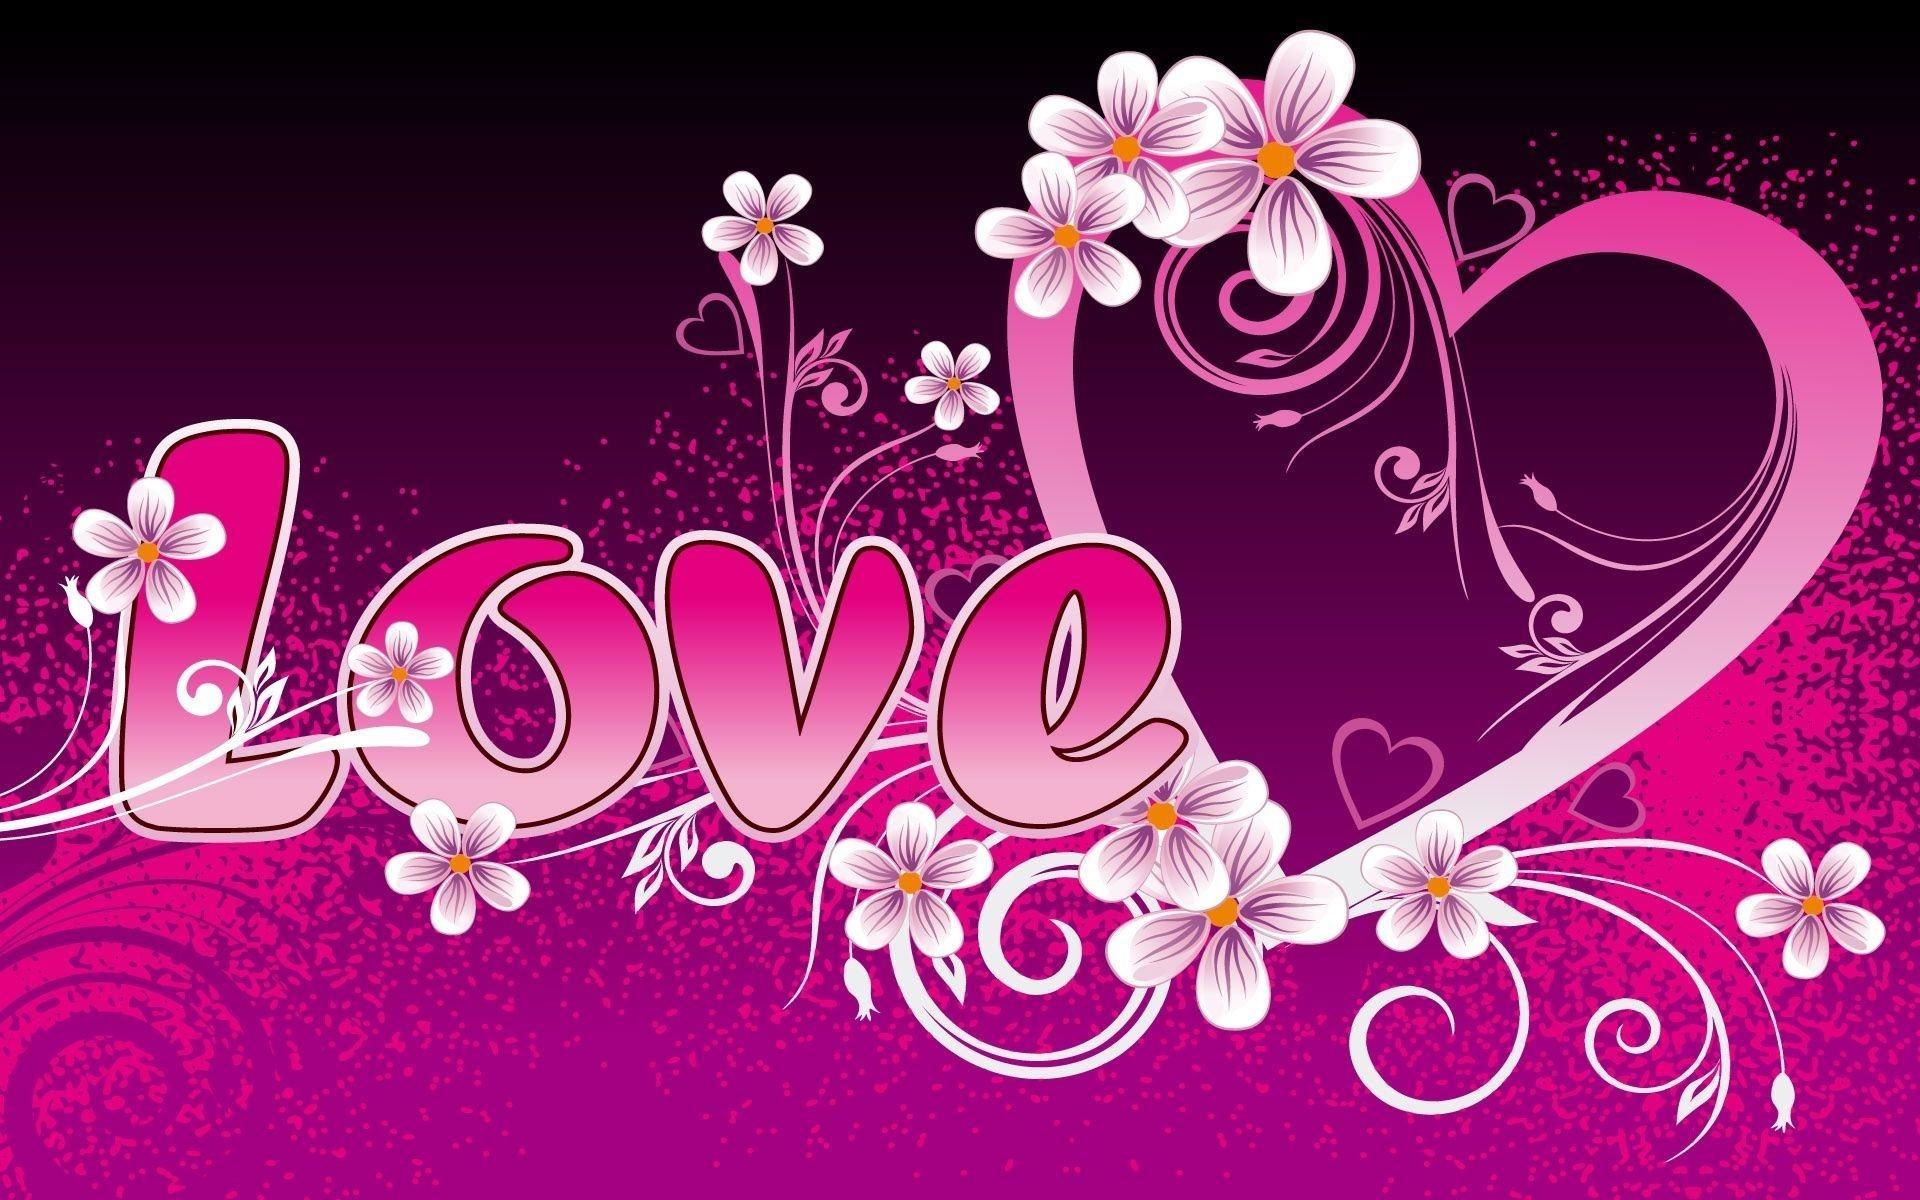 Wallpapers Backgrounds – Pink Love Heart Wallpaper Resolution